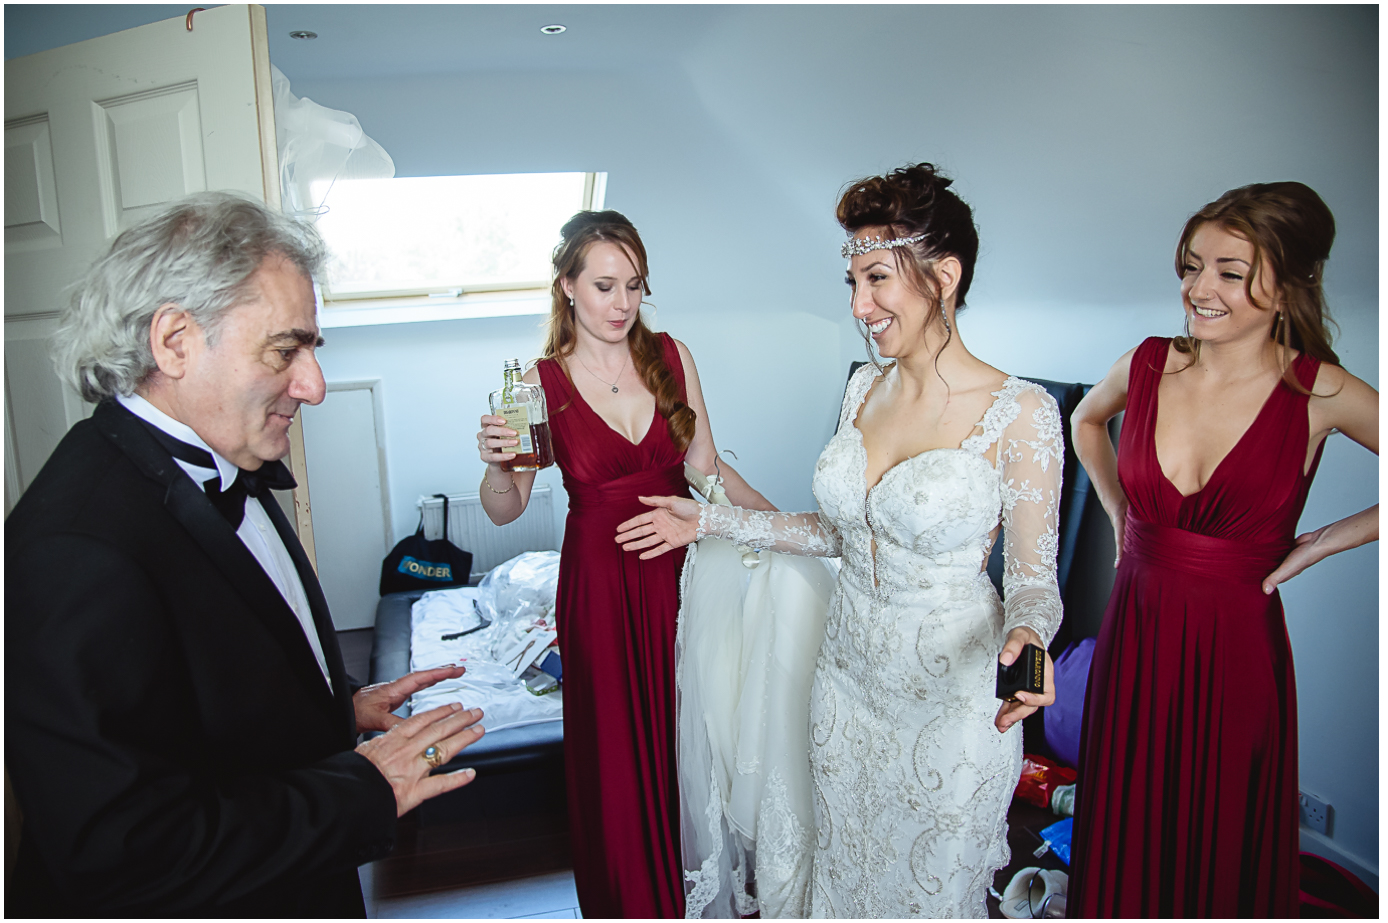 iranian wedding photographer 31 - Drapers Hall London Wedding Photographer